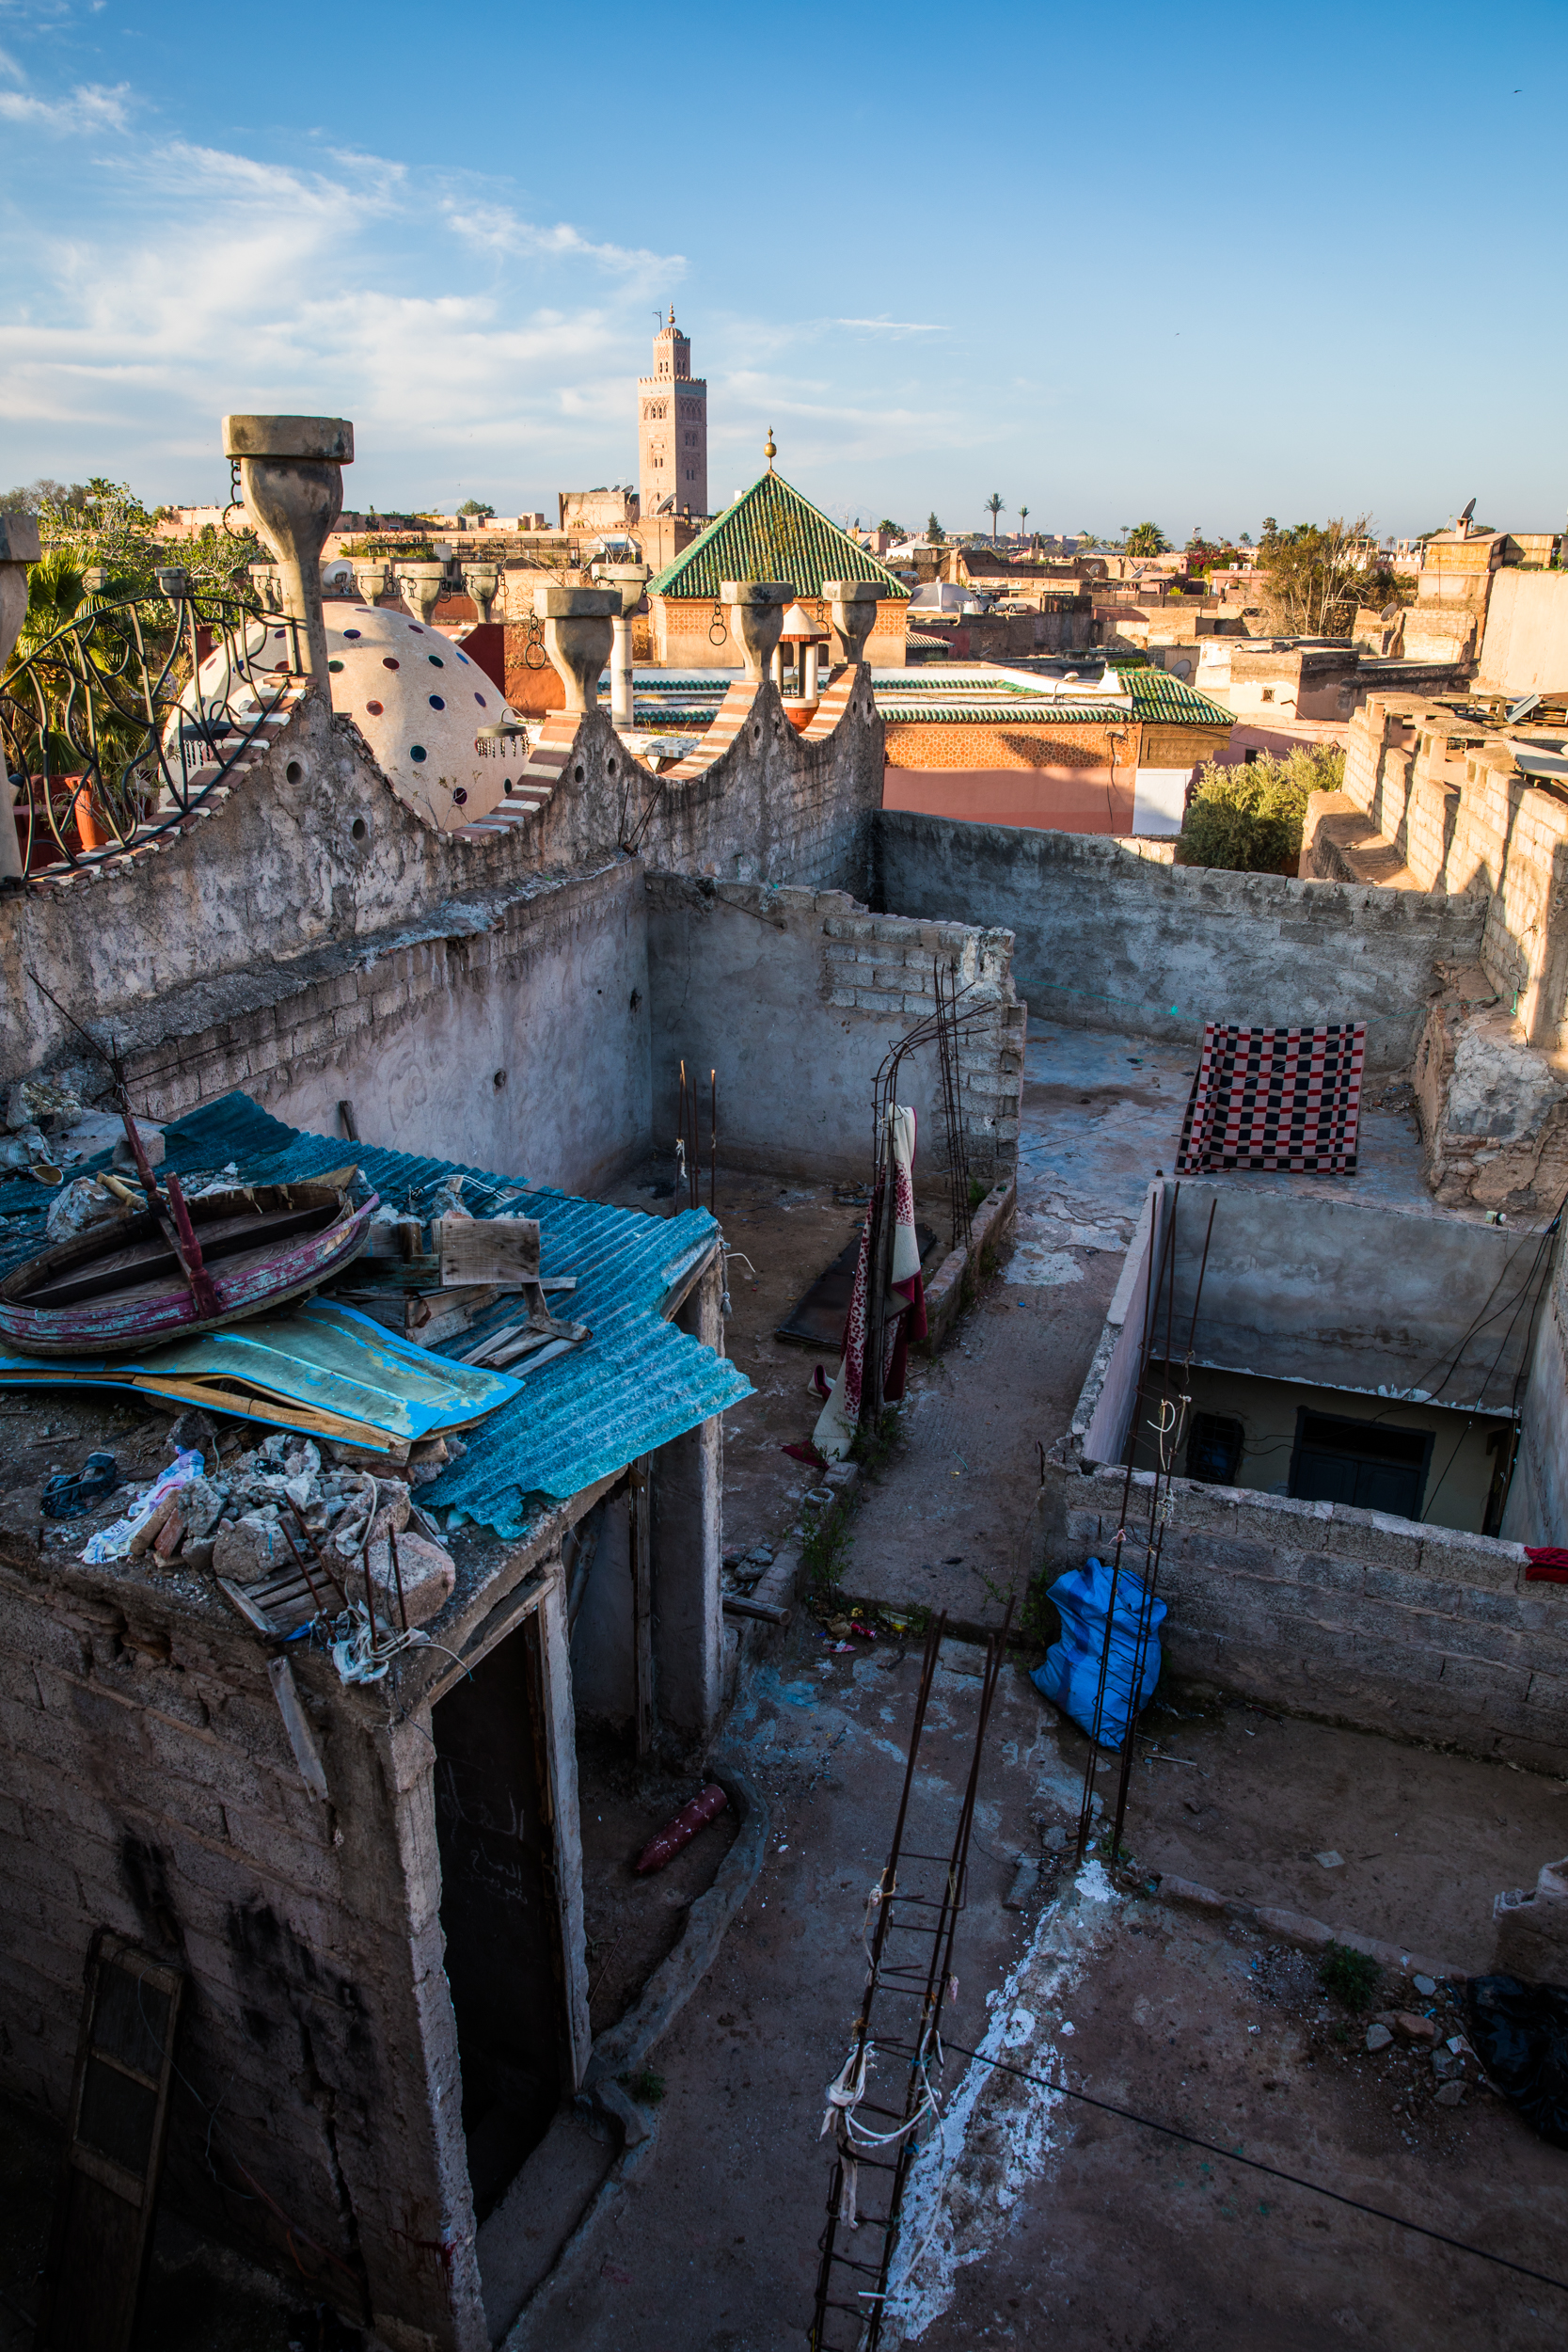 Colin_Herrington_Maroc_Stories-6.jpg